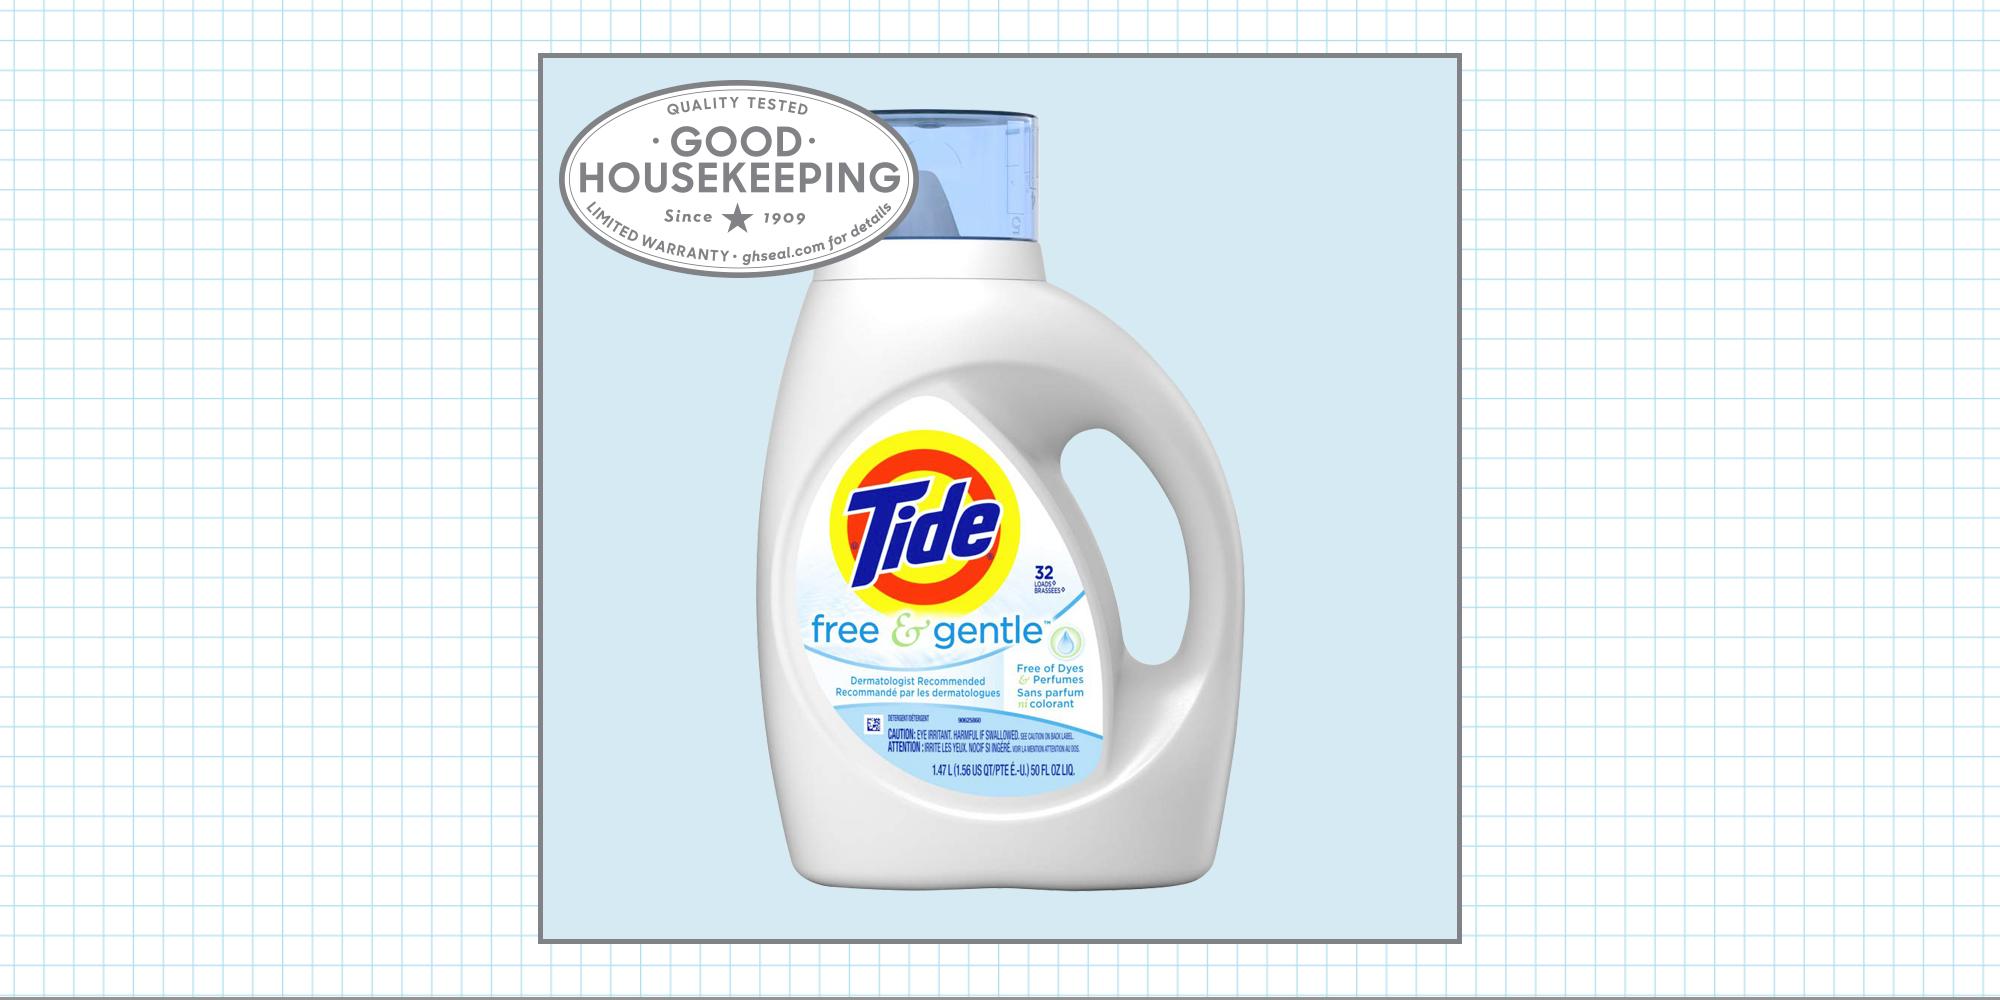 GH Seal Spotlight: Tide Detergents